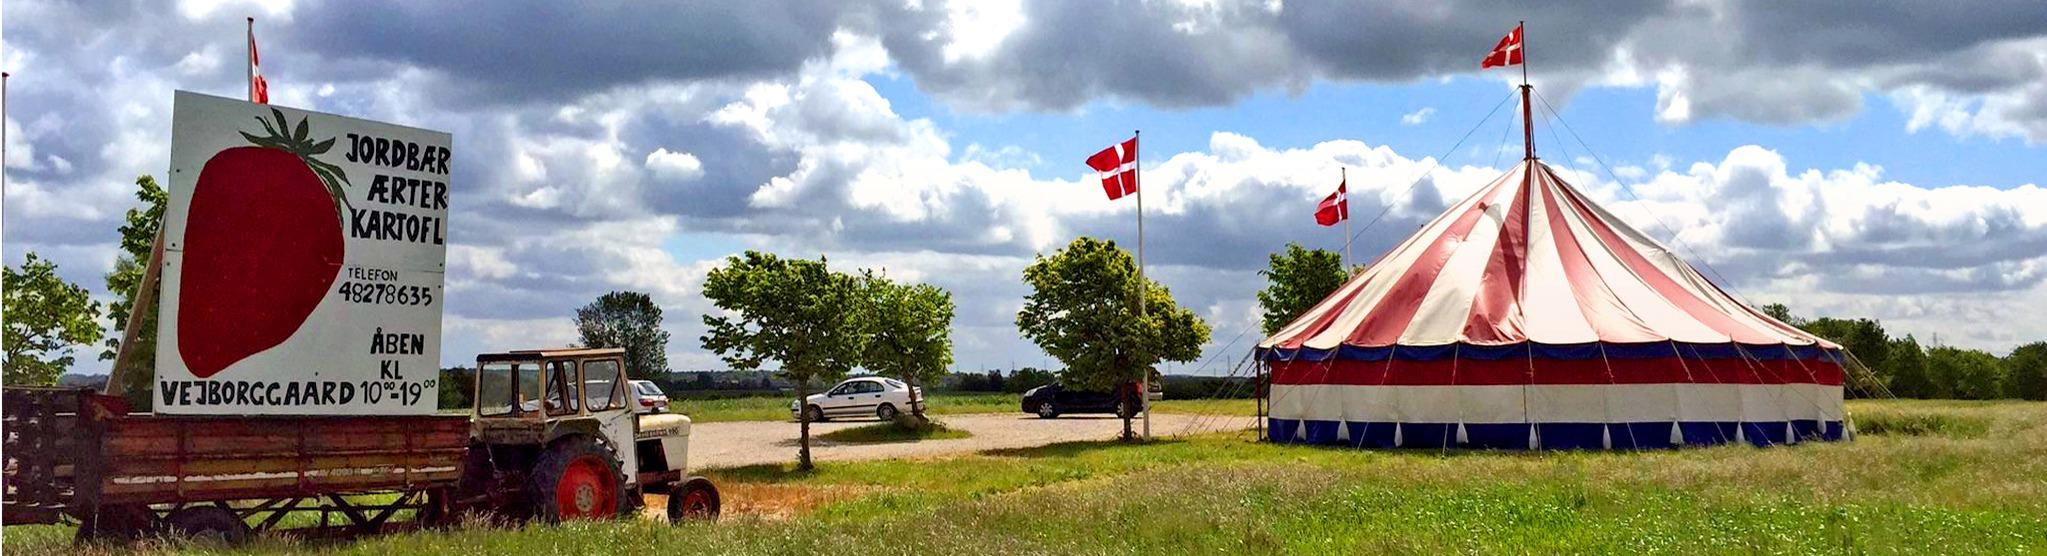 Jordbærcentret Vejborggaard